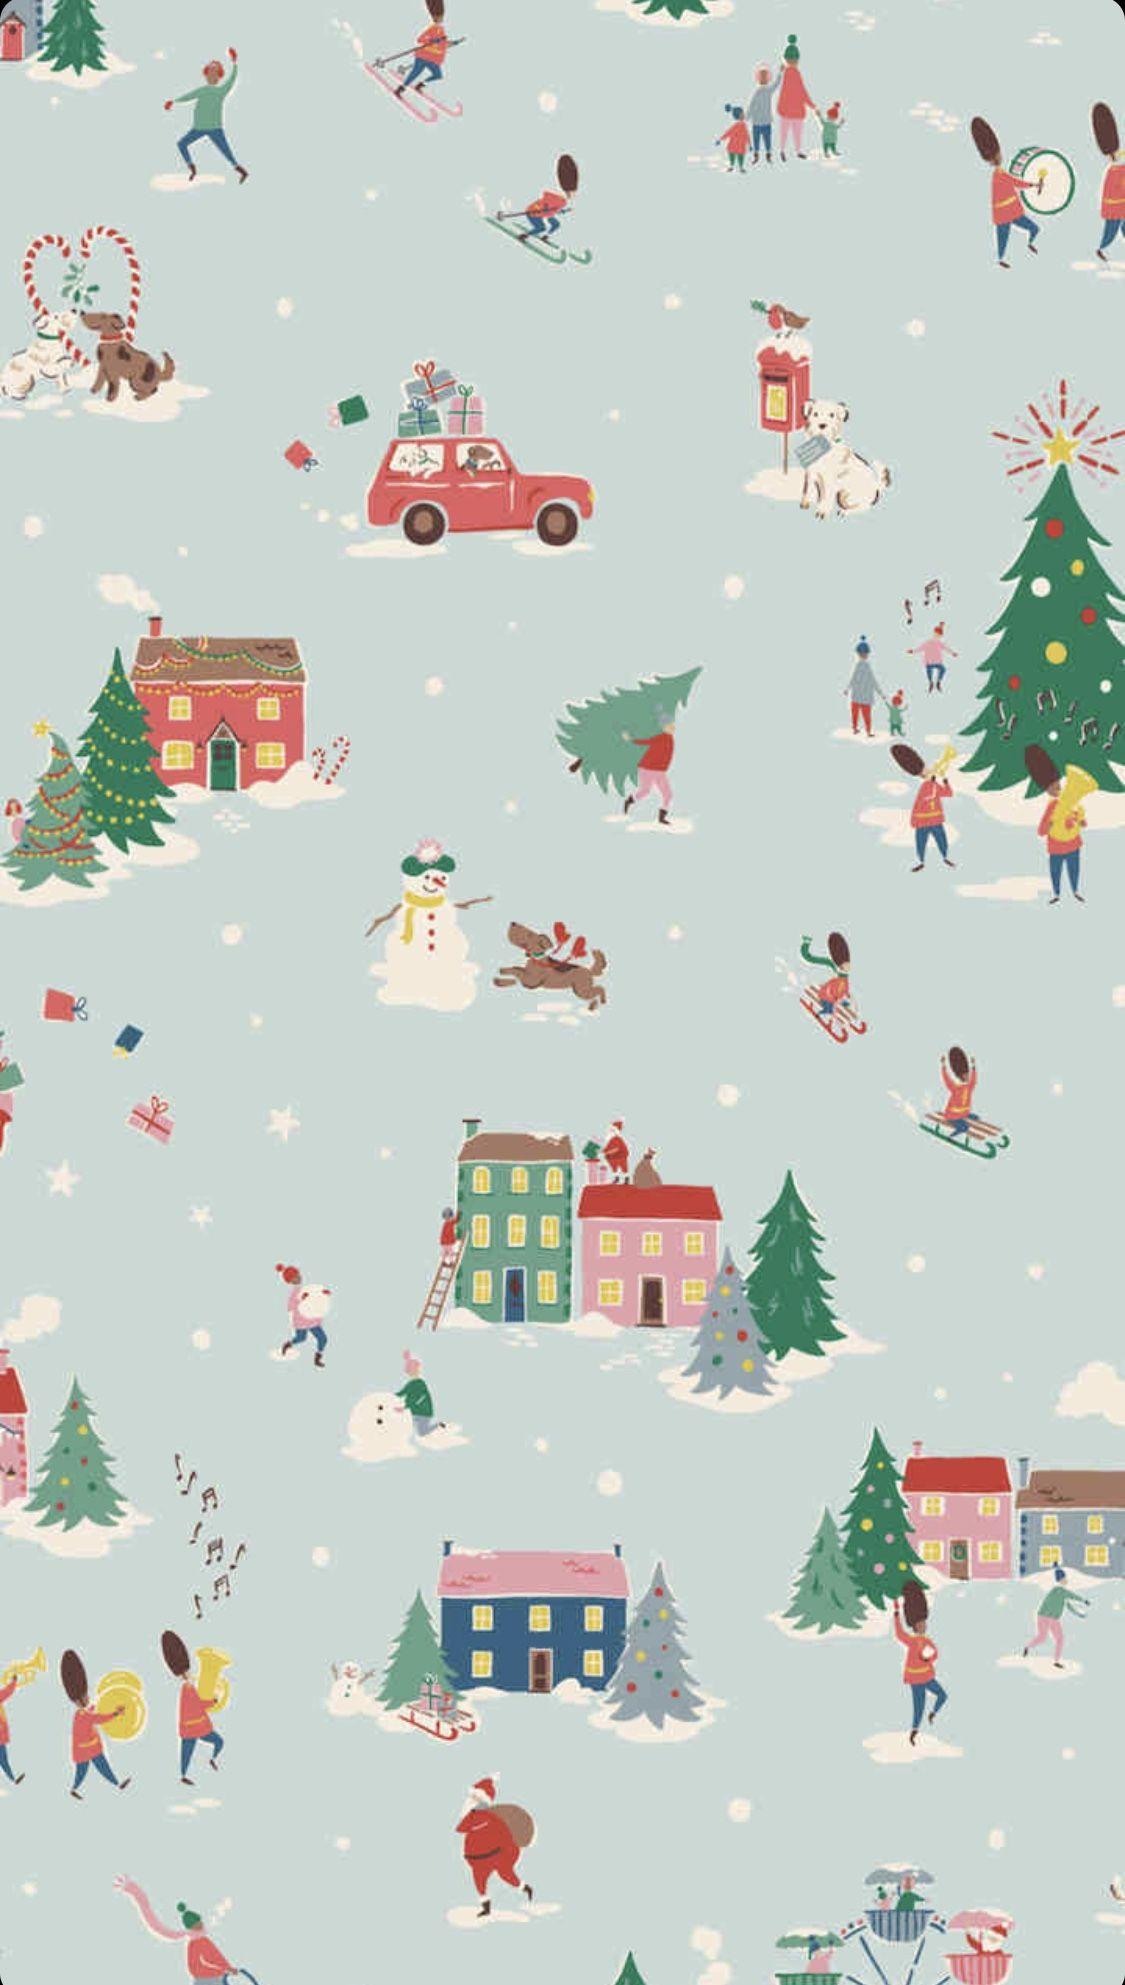 Cath Kidston Christmas 2019 Wallpaper Iphone Christmas Cute Christmas Wallpaper Christmas Wallpaper